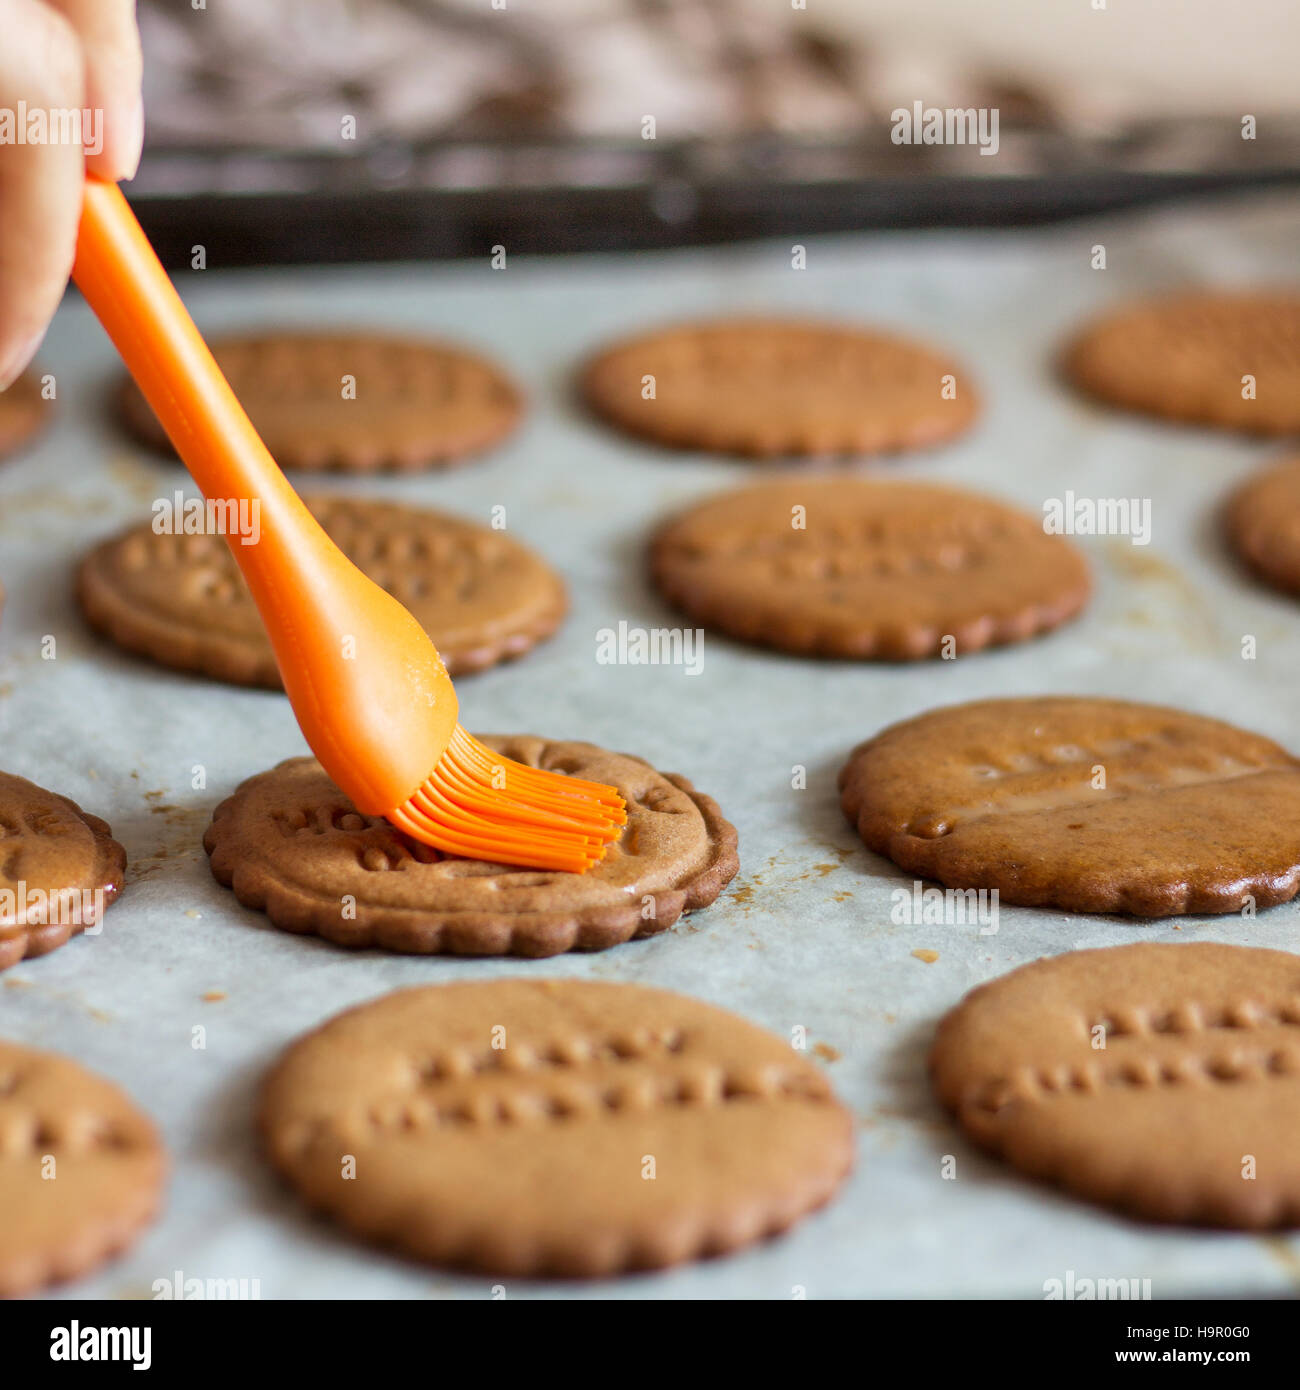 Homemade Gingerbread Cookies - Stock Image